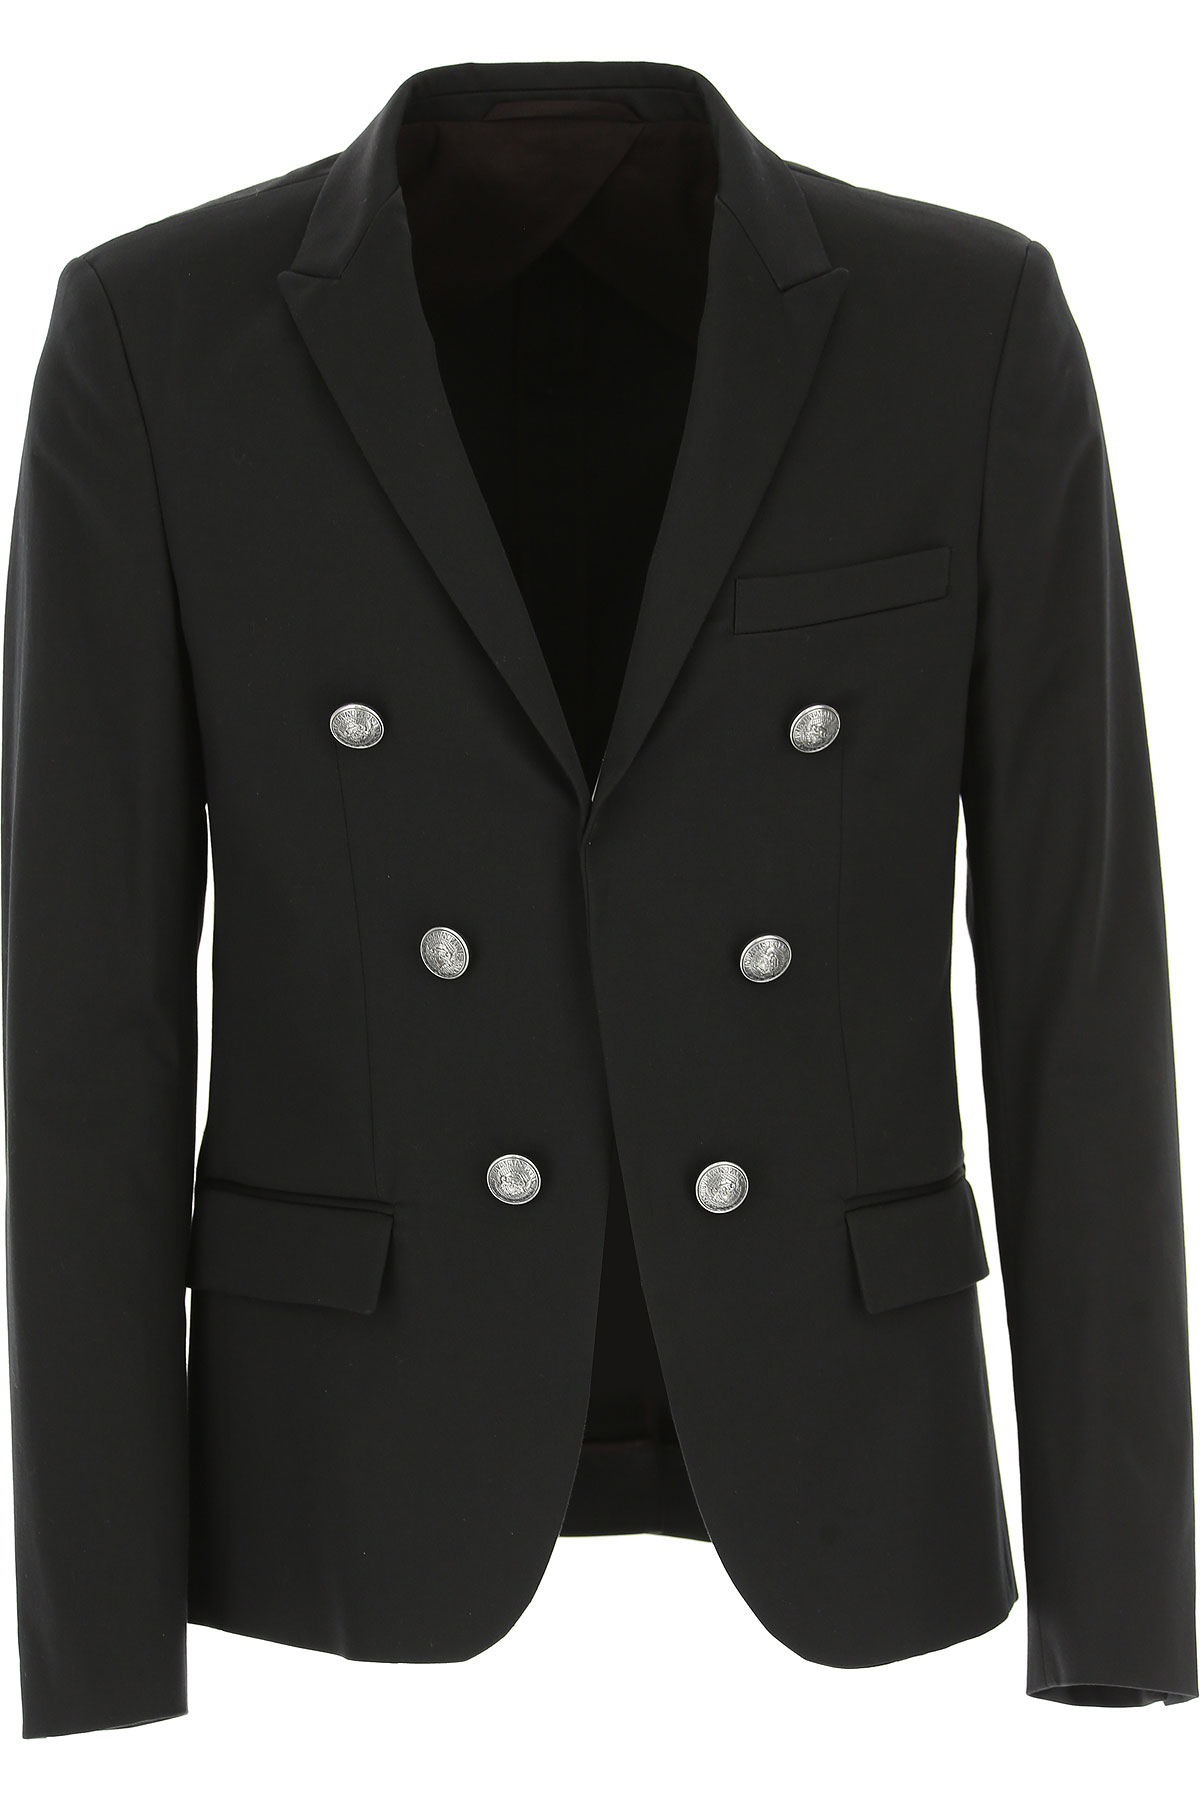 Image of Balmain Blazer for Men, Sport Coat, Black, Cotton, 2017, L M XL